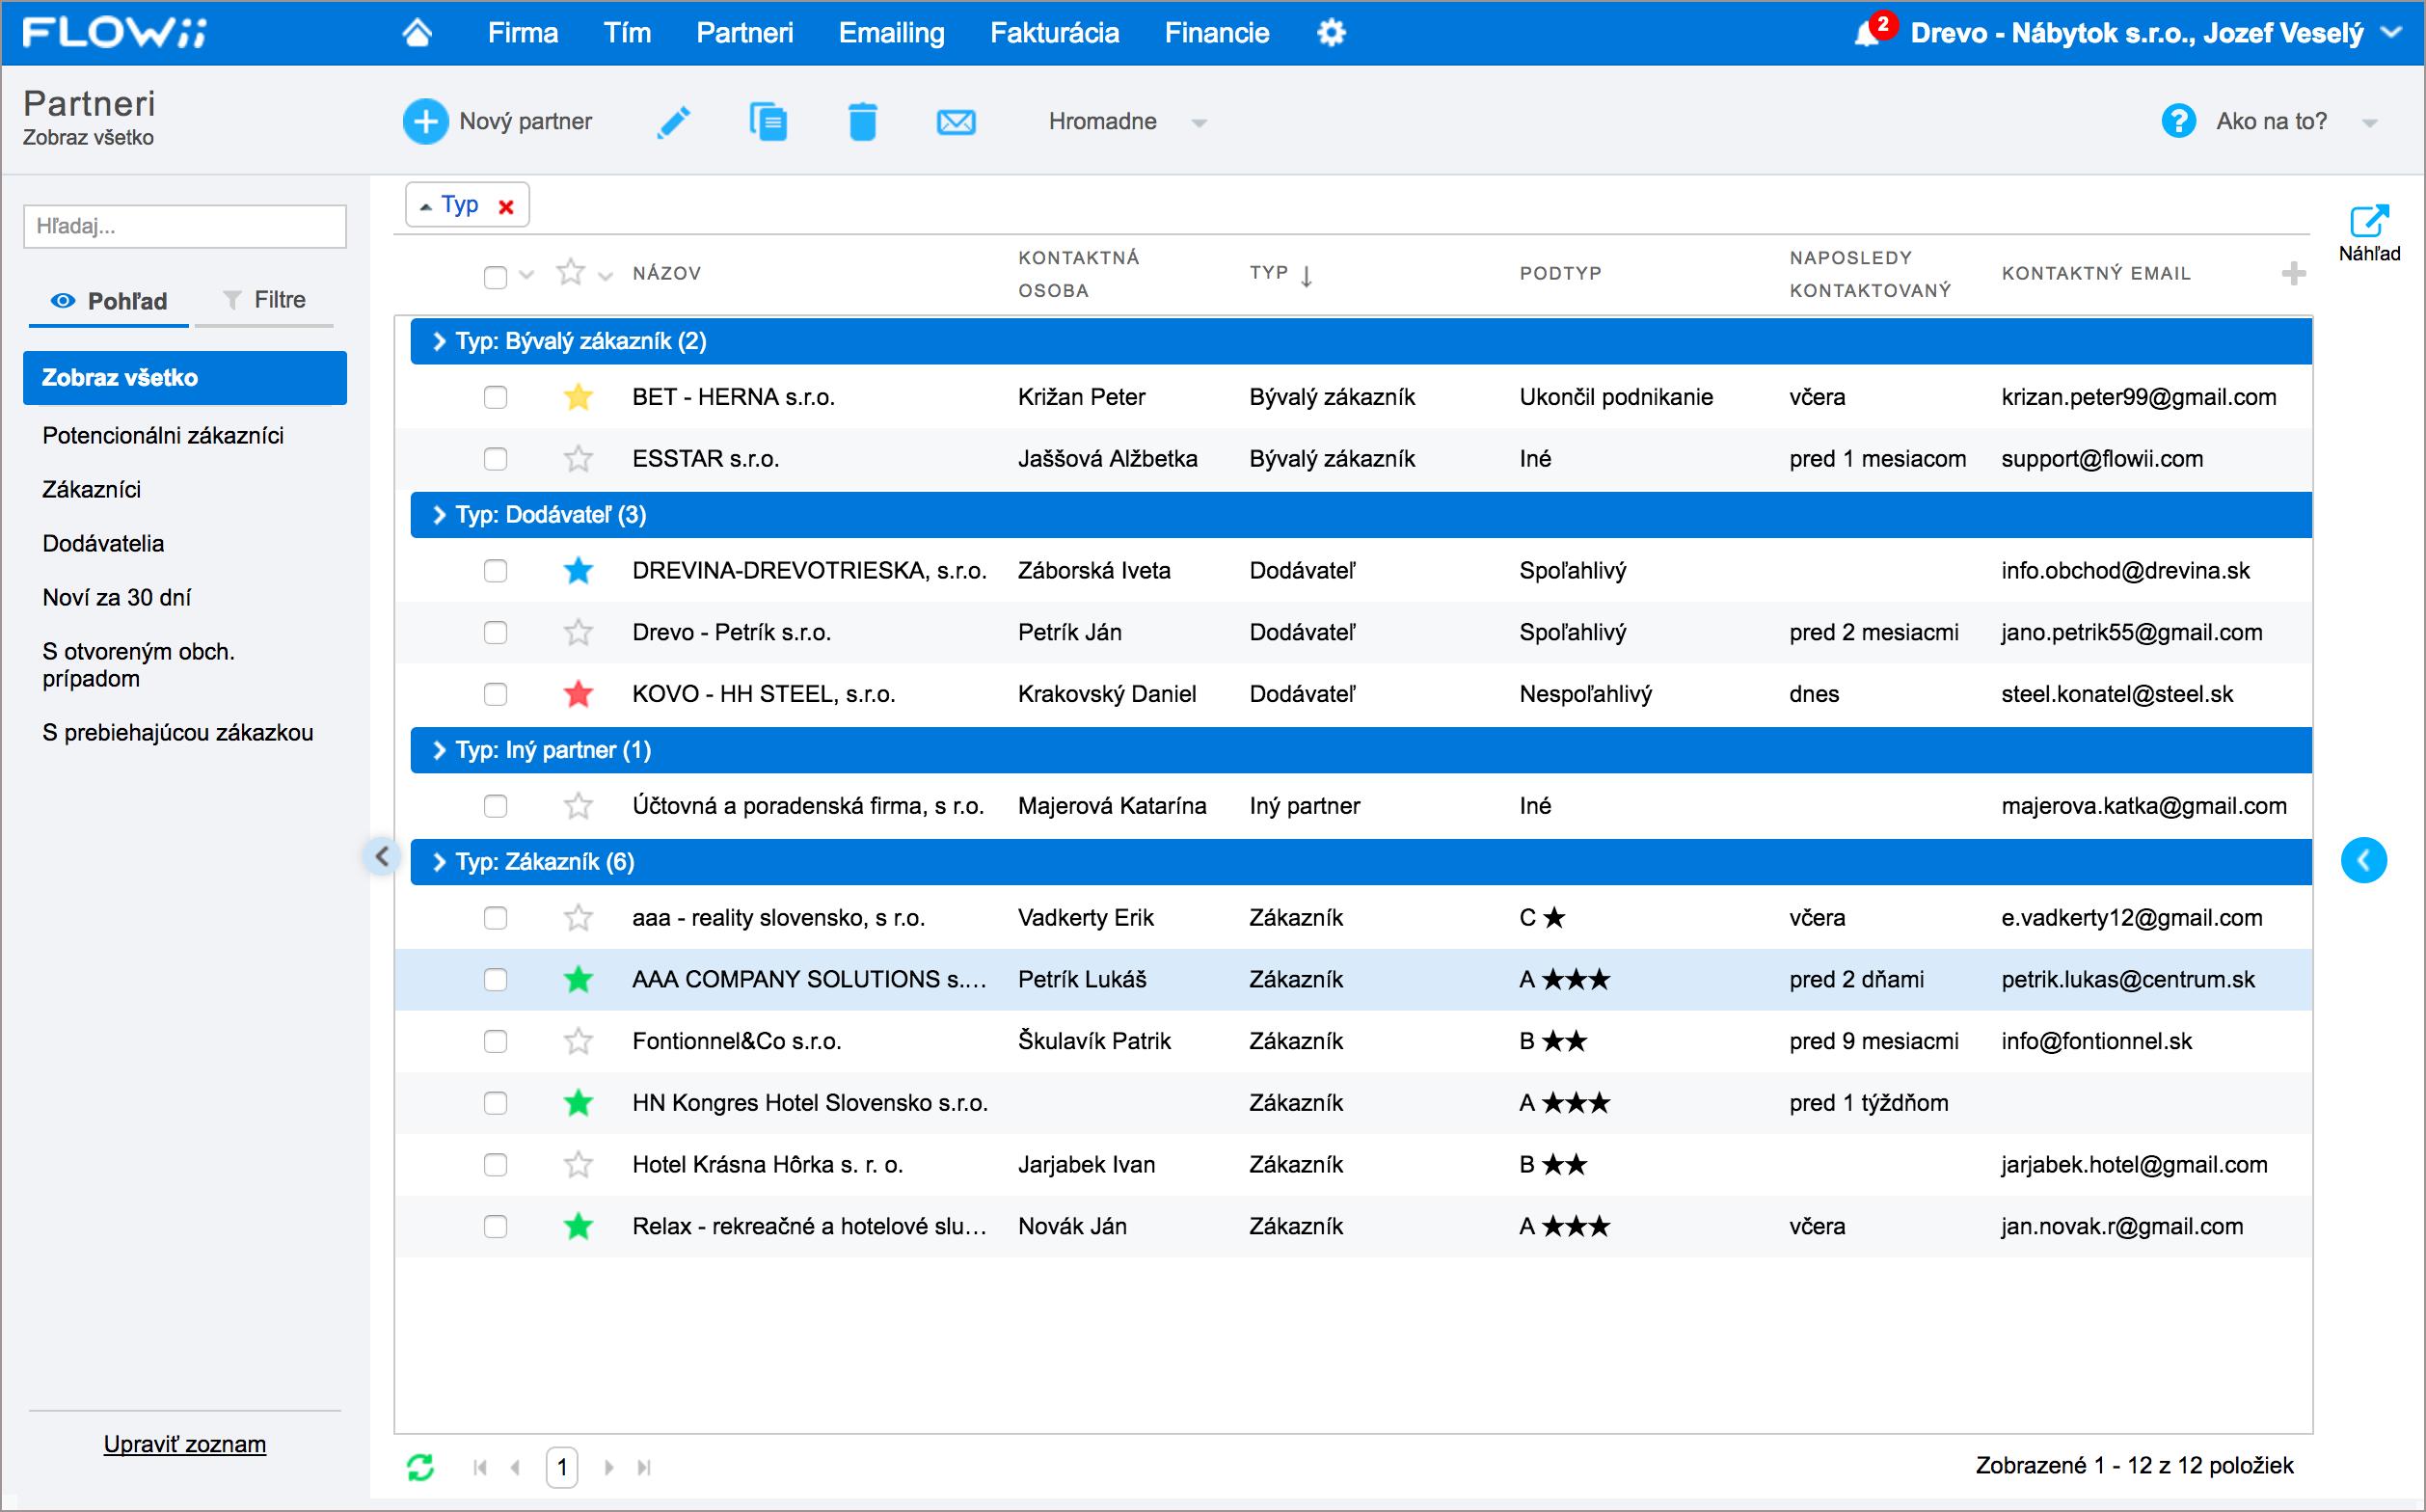 Emailing - databáza partnerov